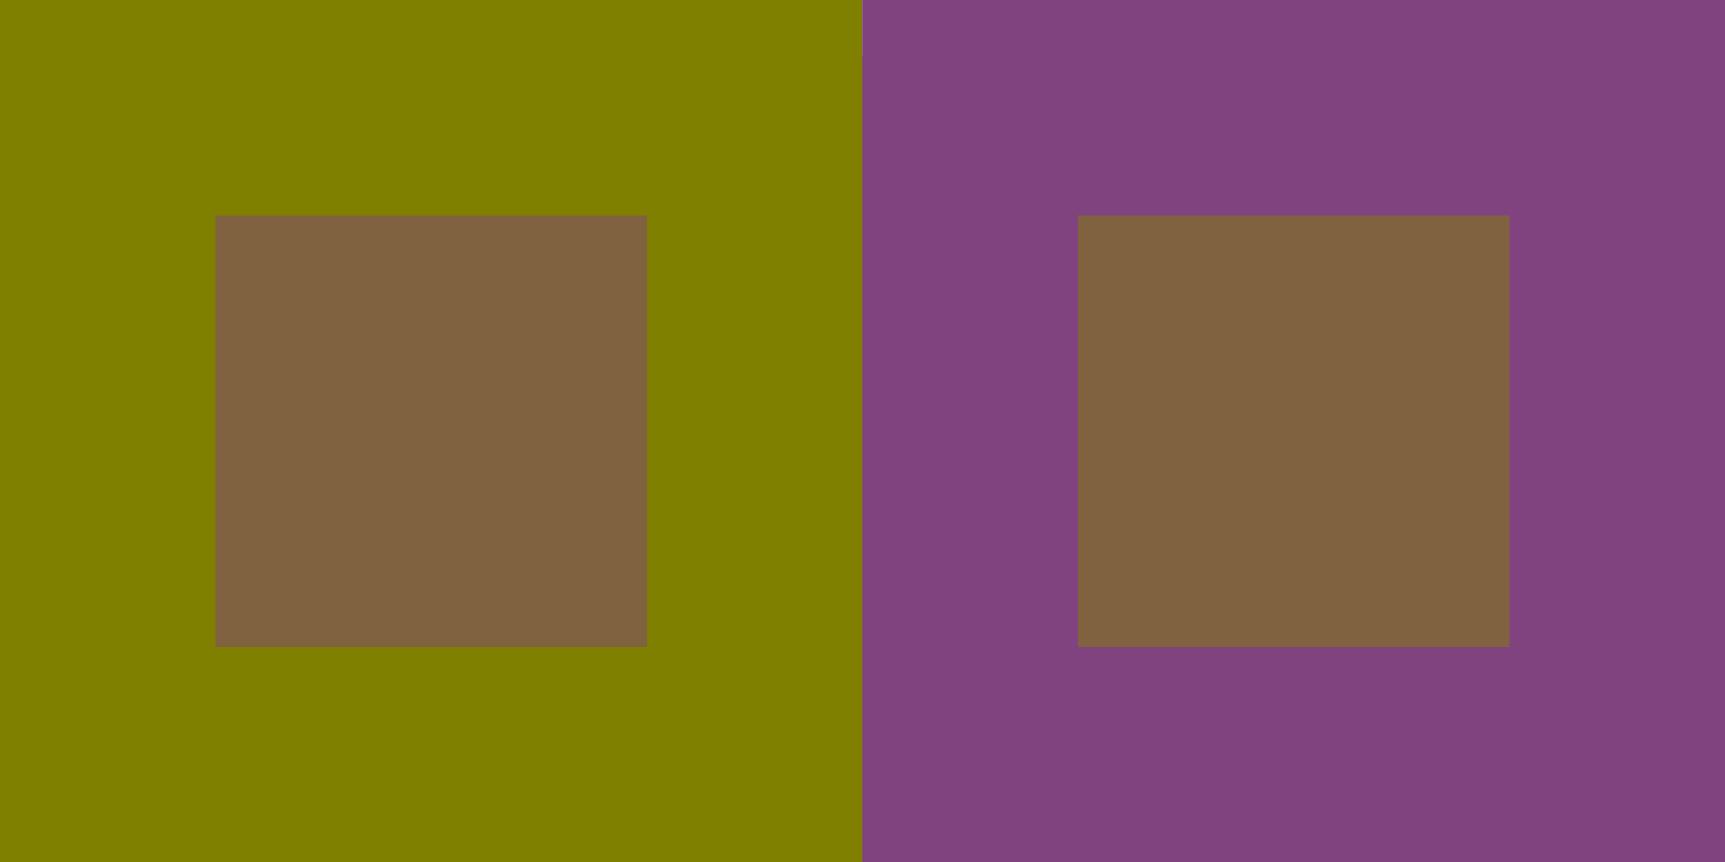 029. estudios a partir de Josef Albers